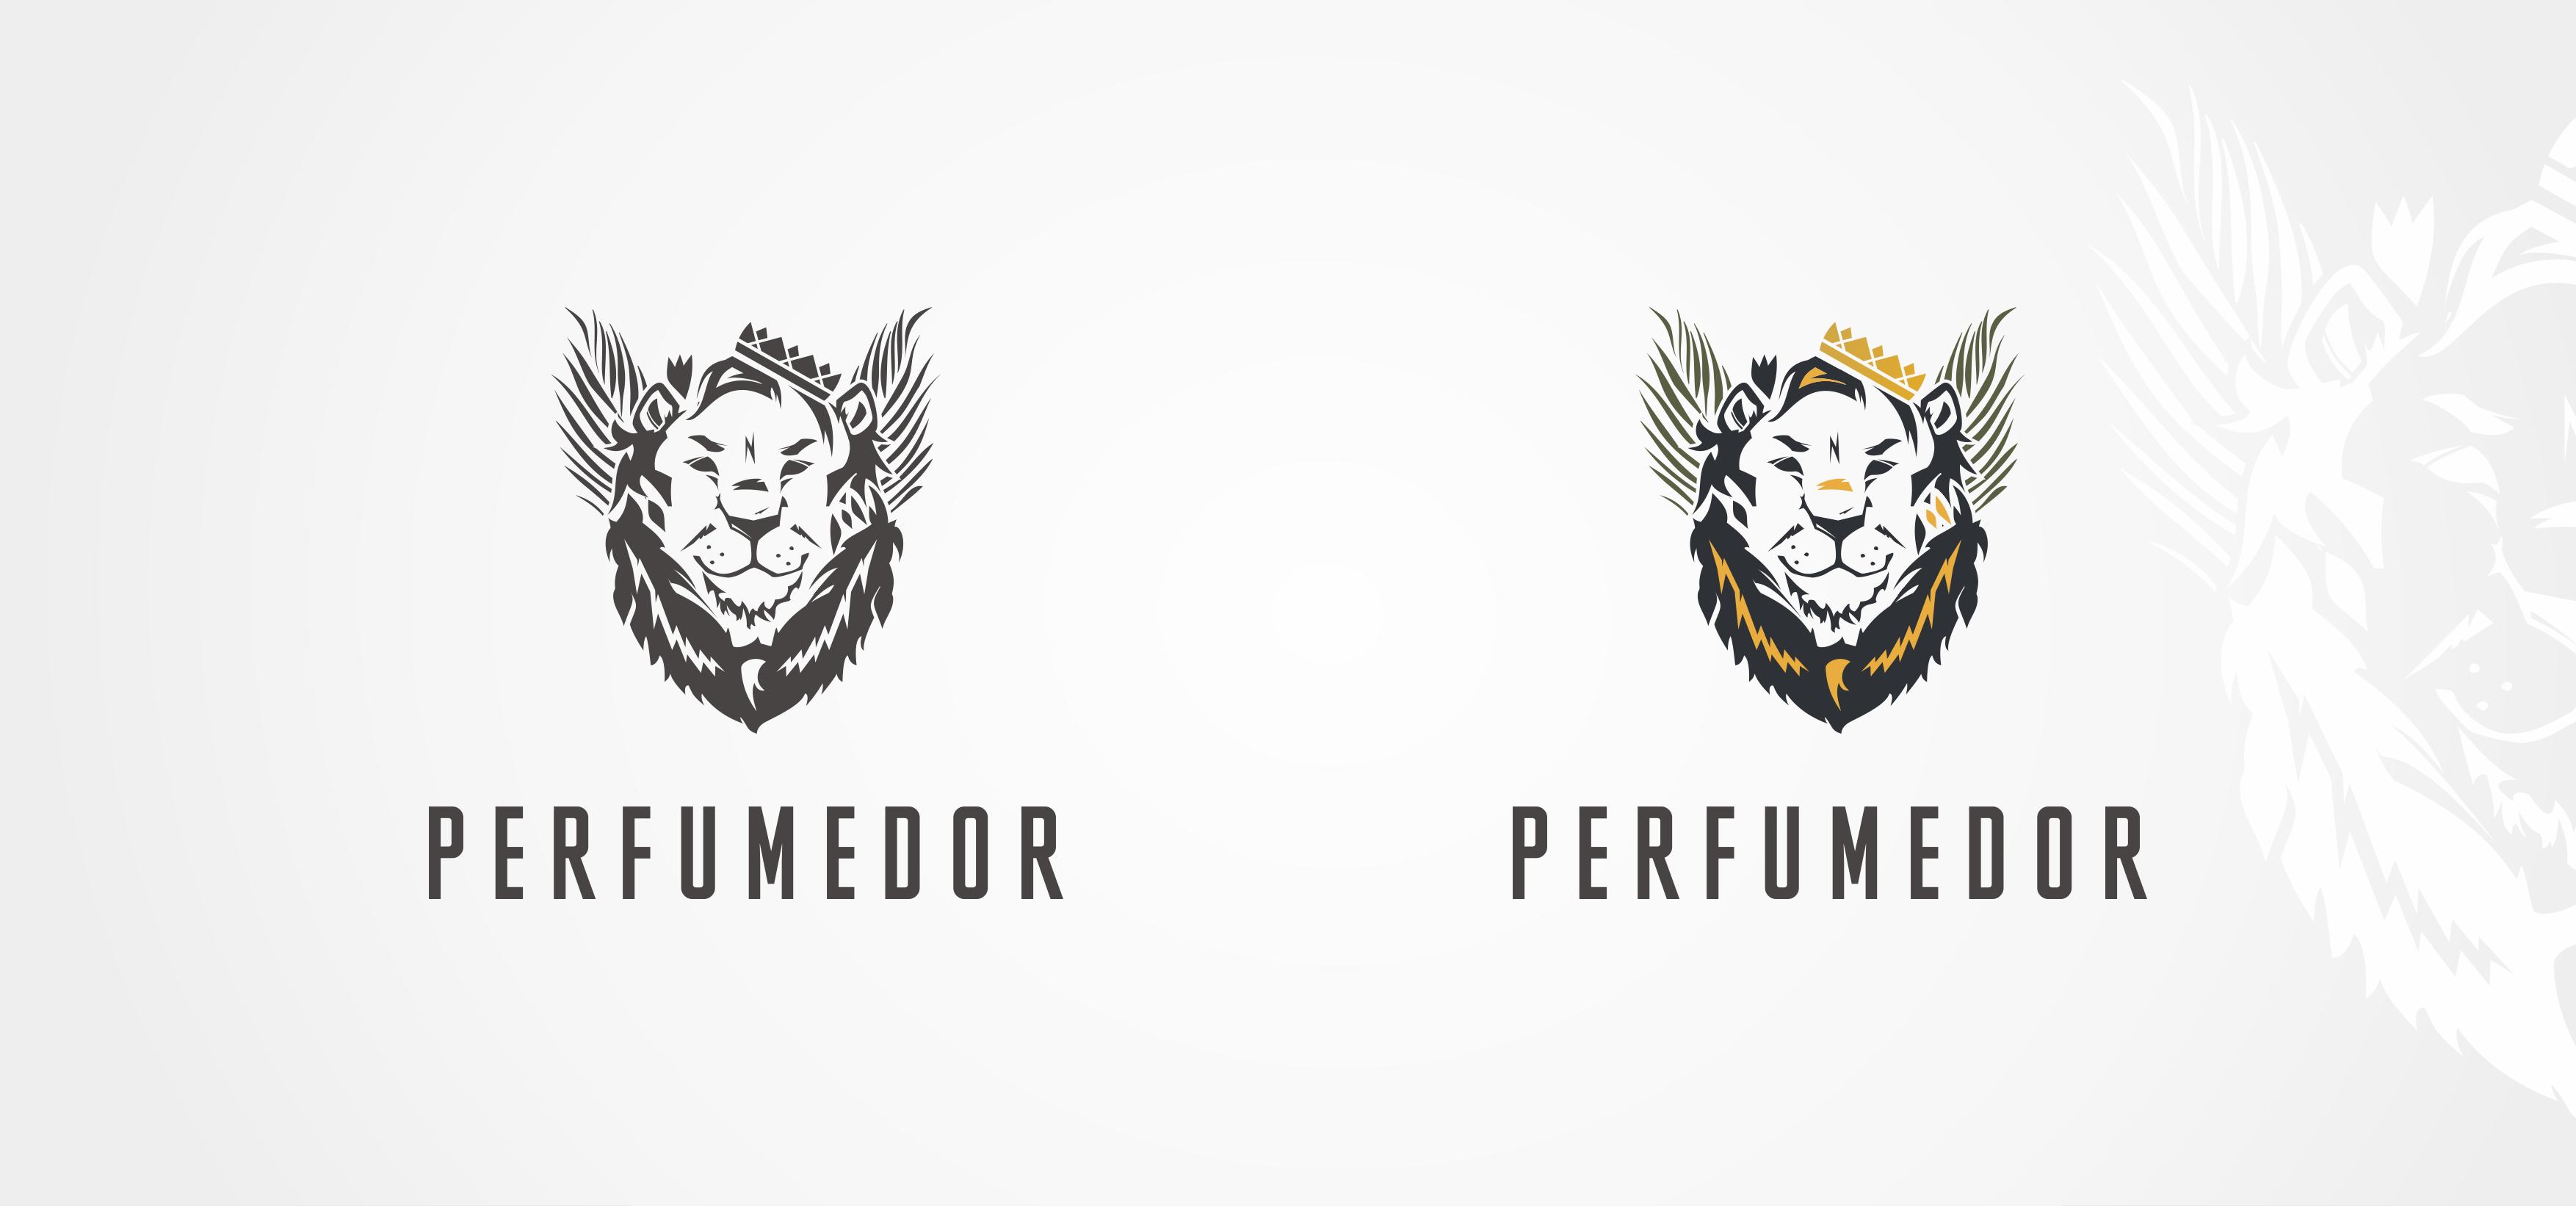 Логотип для интернет-магазина парфюмерии фото f_5415b458408610be.png